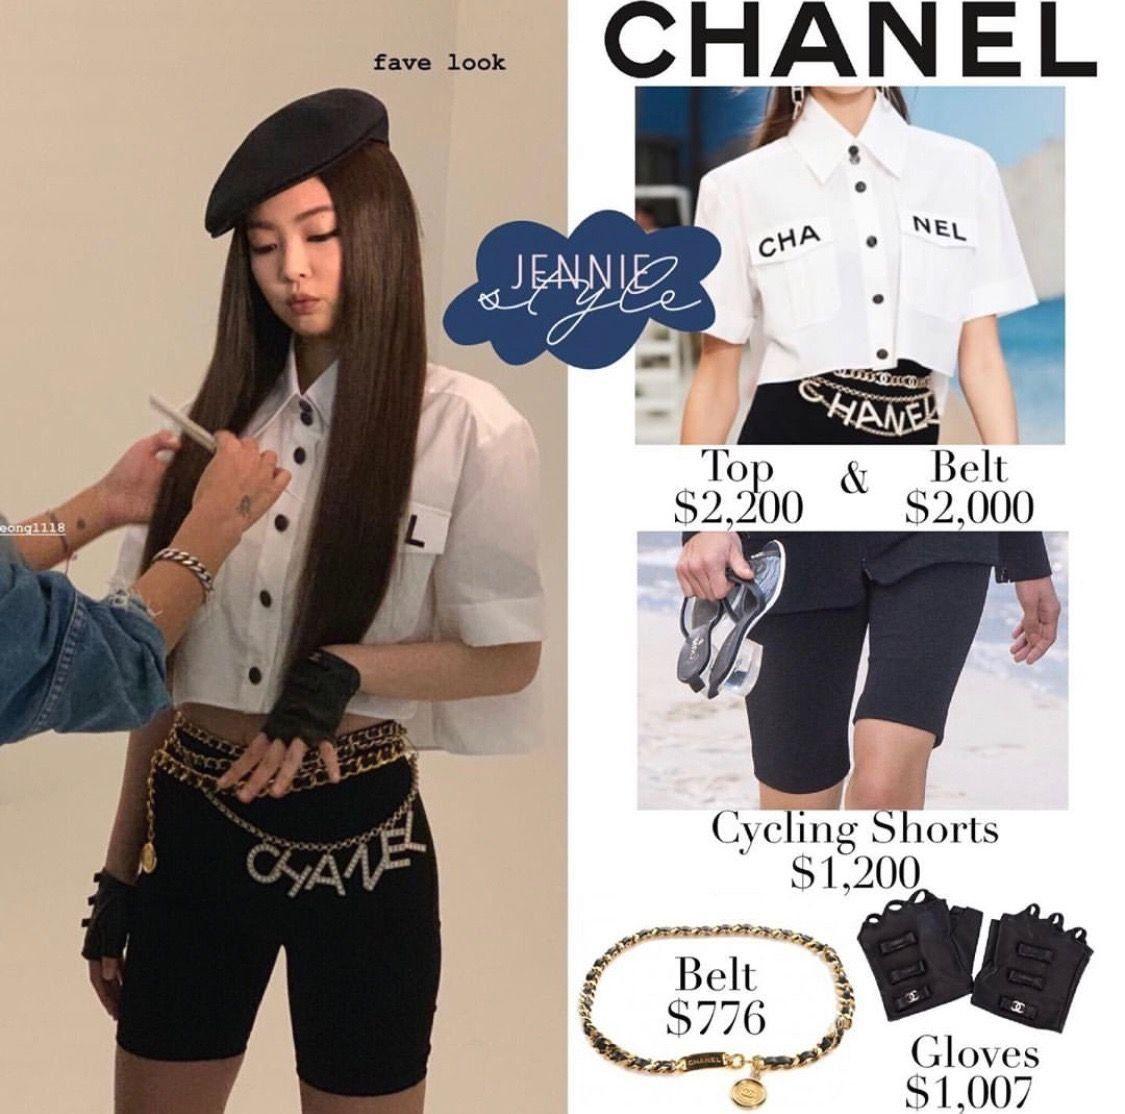 Jennie S Style Jennie S Outfit Jennie S Closet Jennie S Clothes 1000 Pop Clothing Kpop Fashion Outfits Kpop Outfits